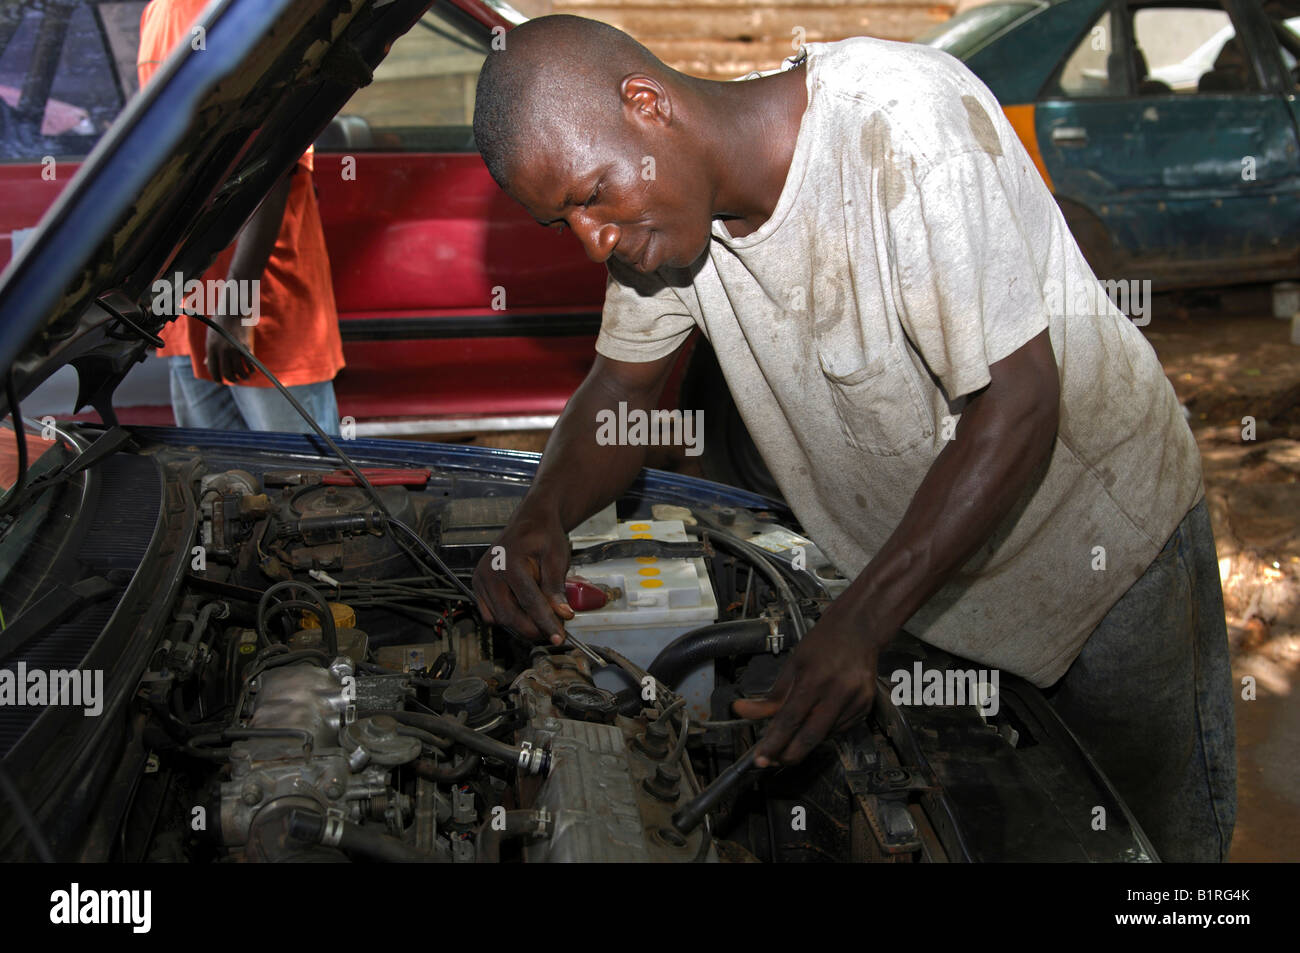 Motor mechanic at work, Accra, Ghana, West Africa - Stock Image